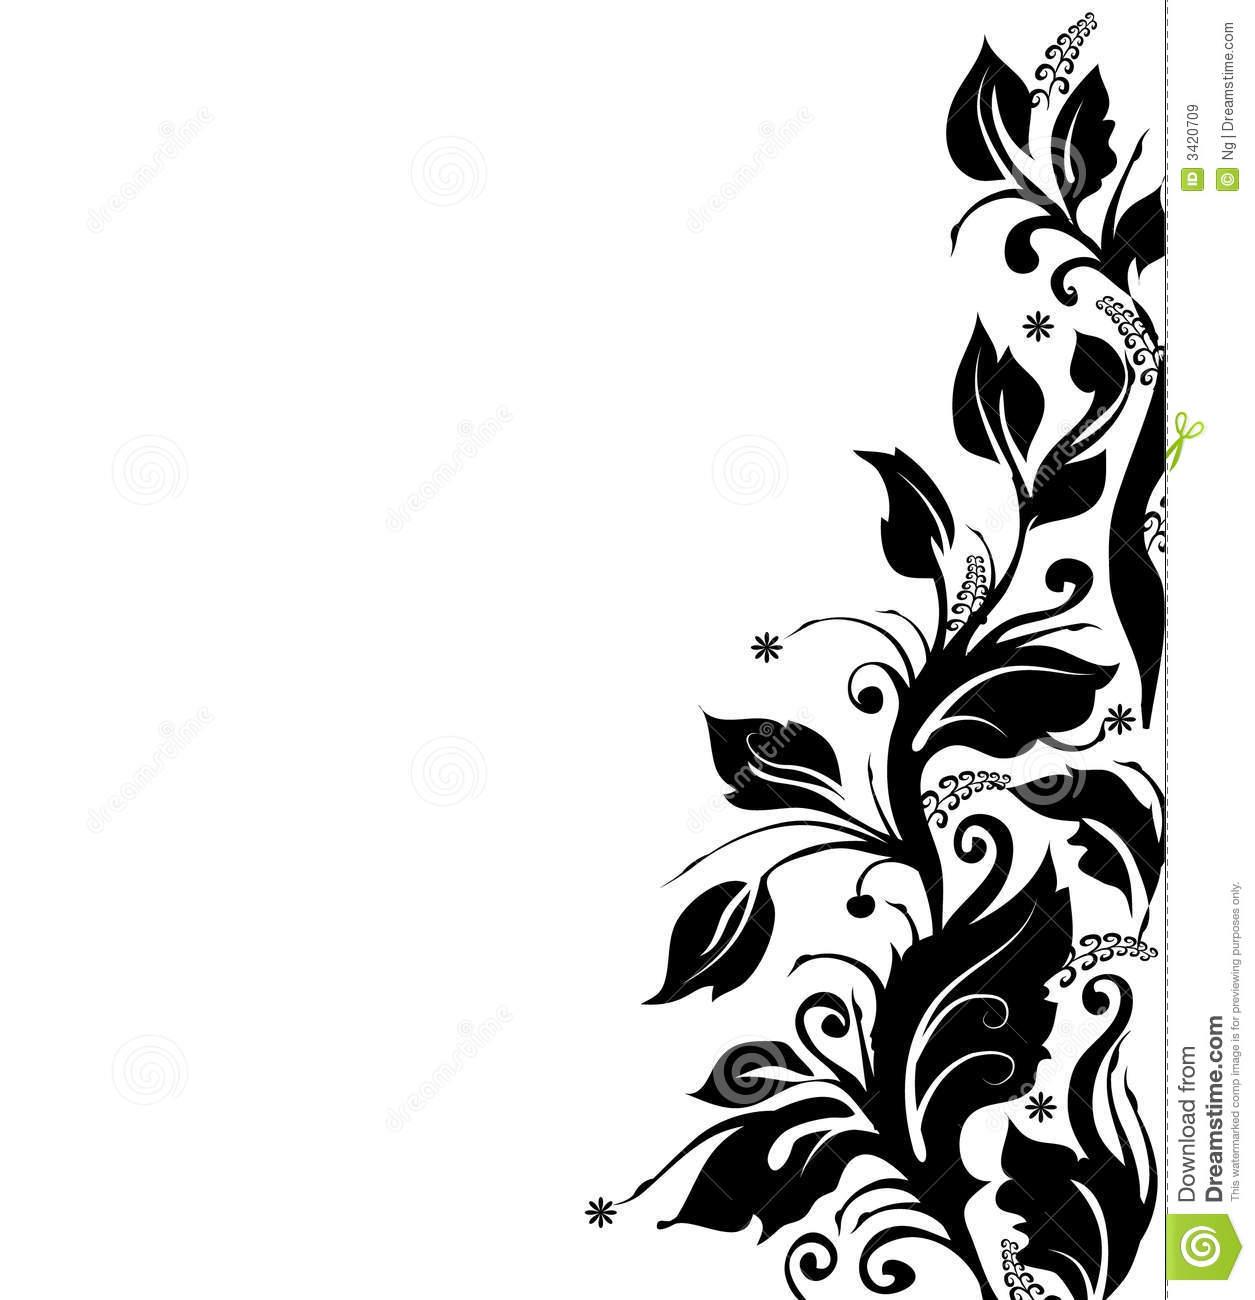 Black and white wallpaper trim wallpapersafari black and white floral border wallpapers the art mad wallpapers 1255x1300 mightylinksfo